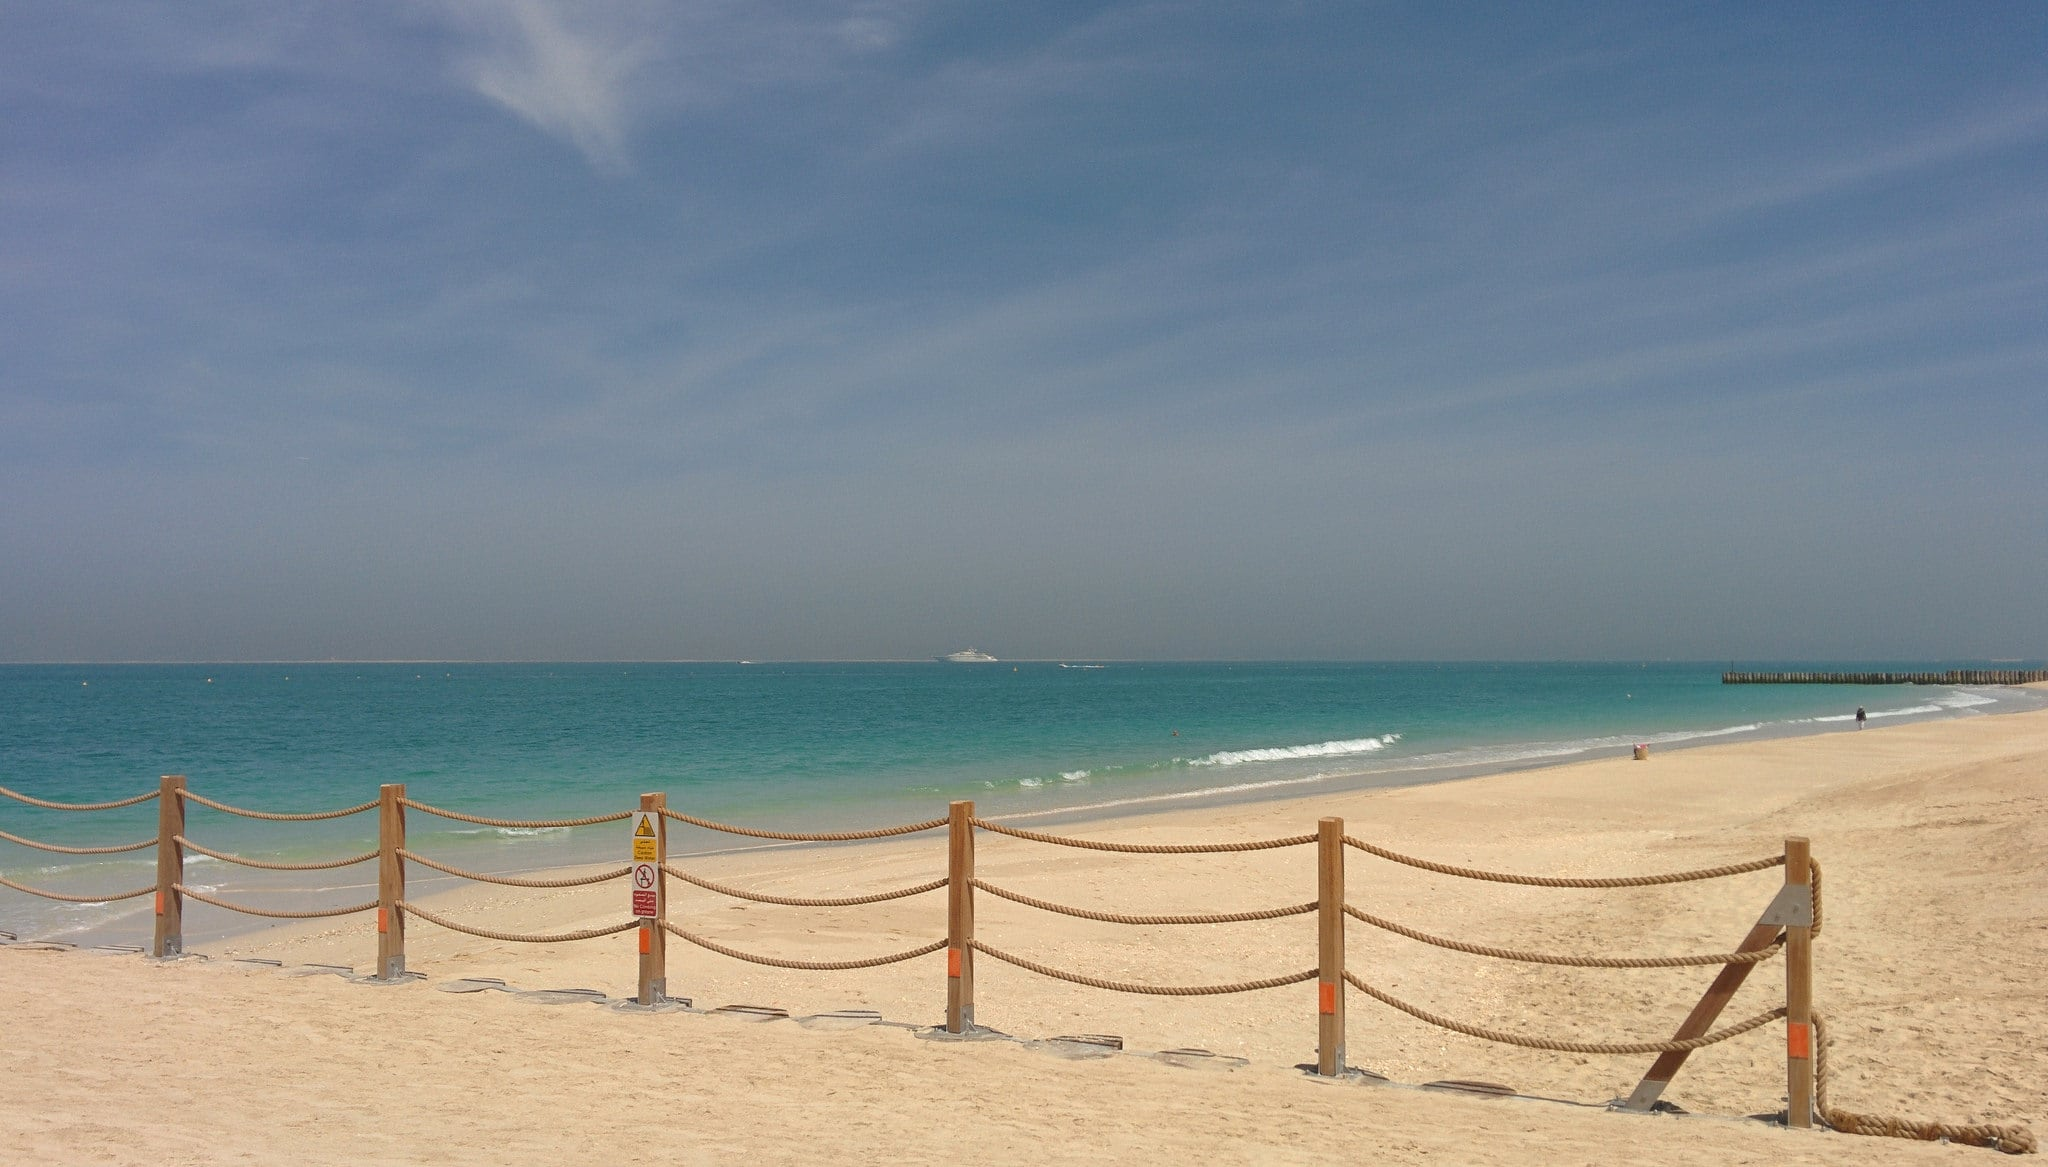 Kite Surf Beach 海滩与 2602 米的长度 的形象.